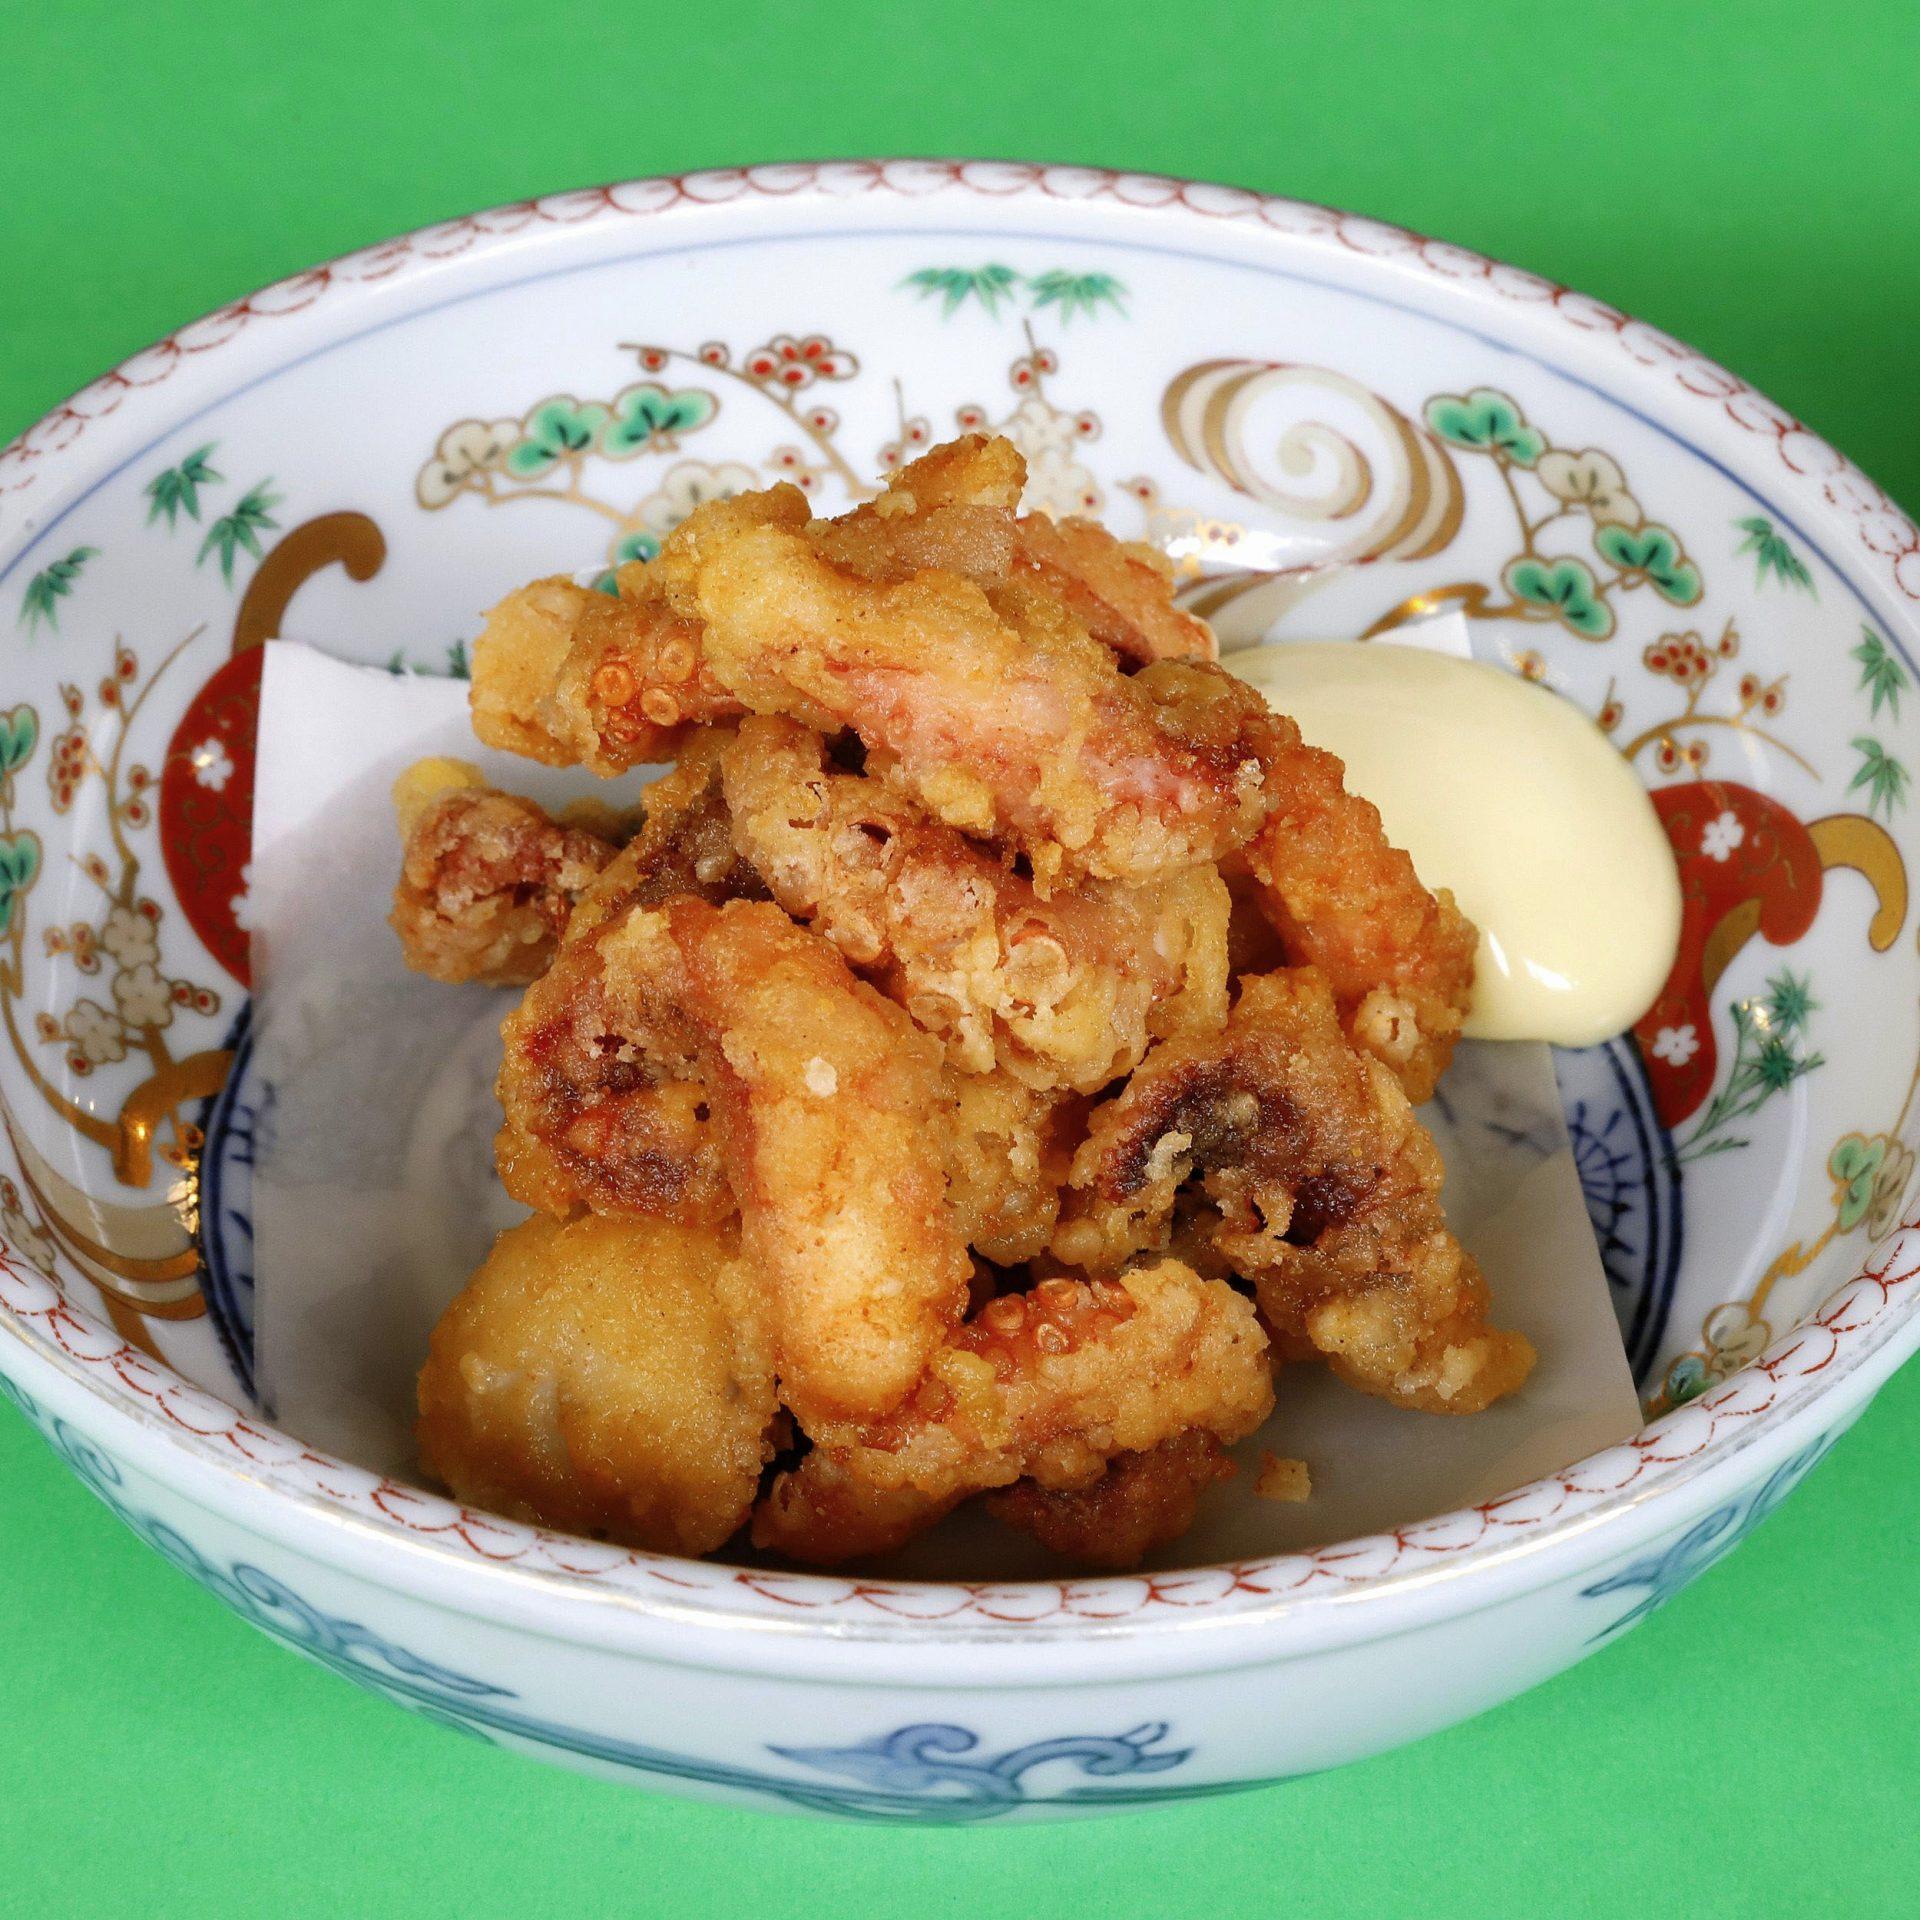 cucina piatti poporoya